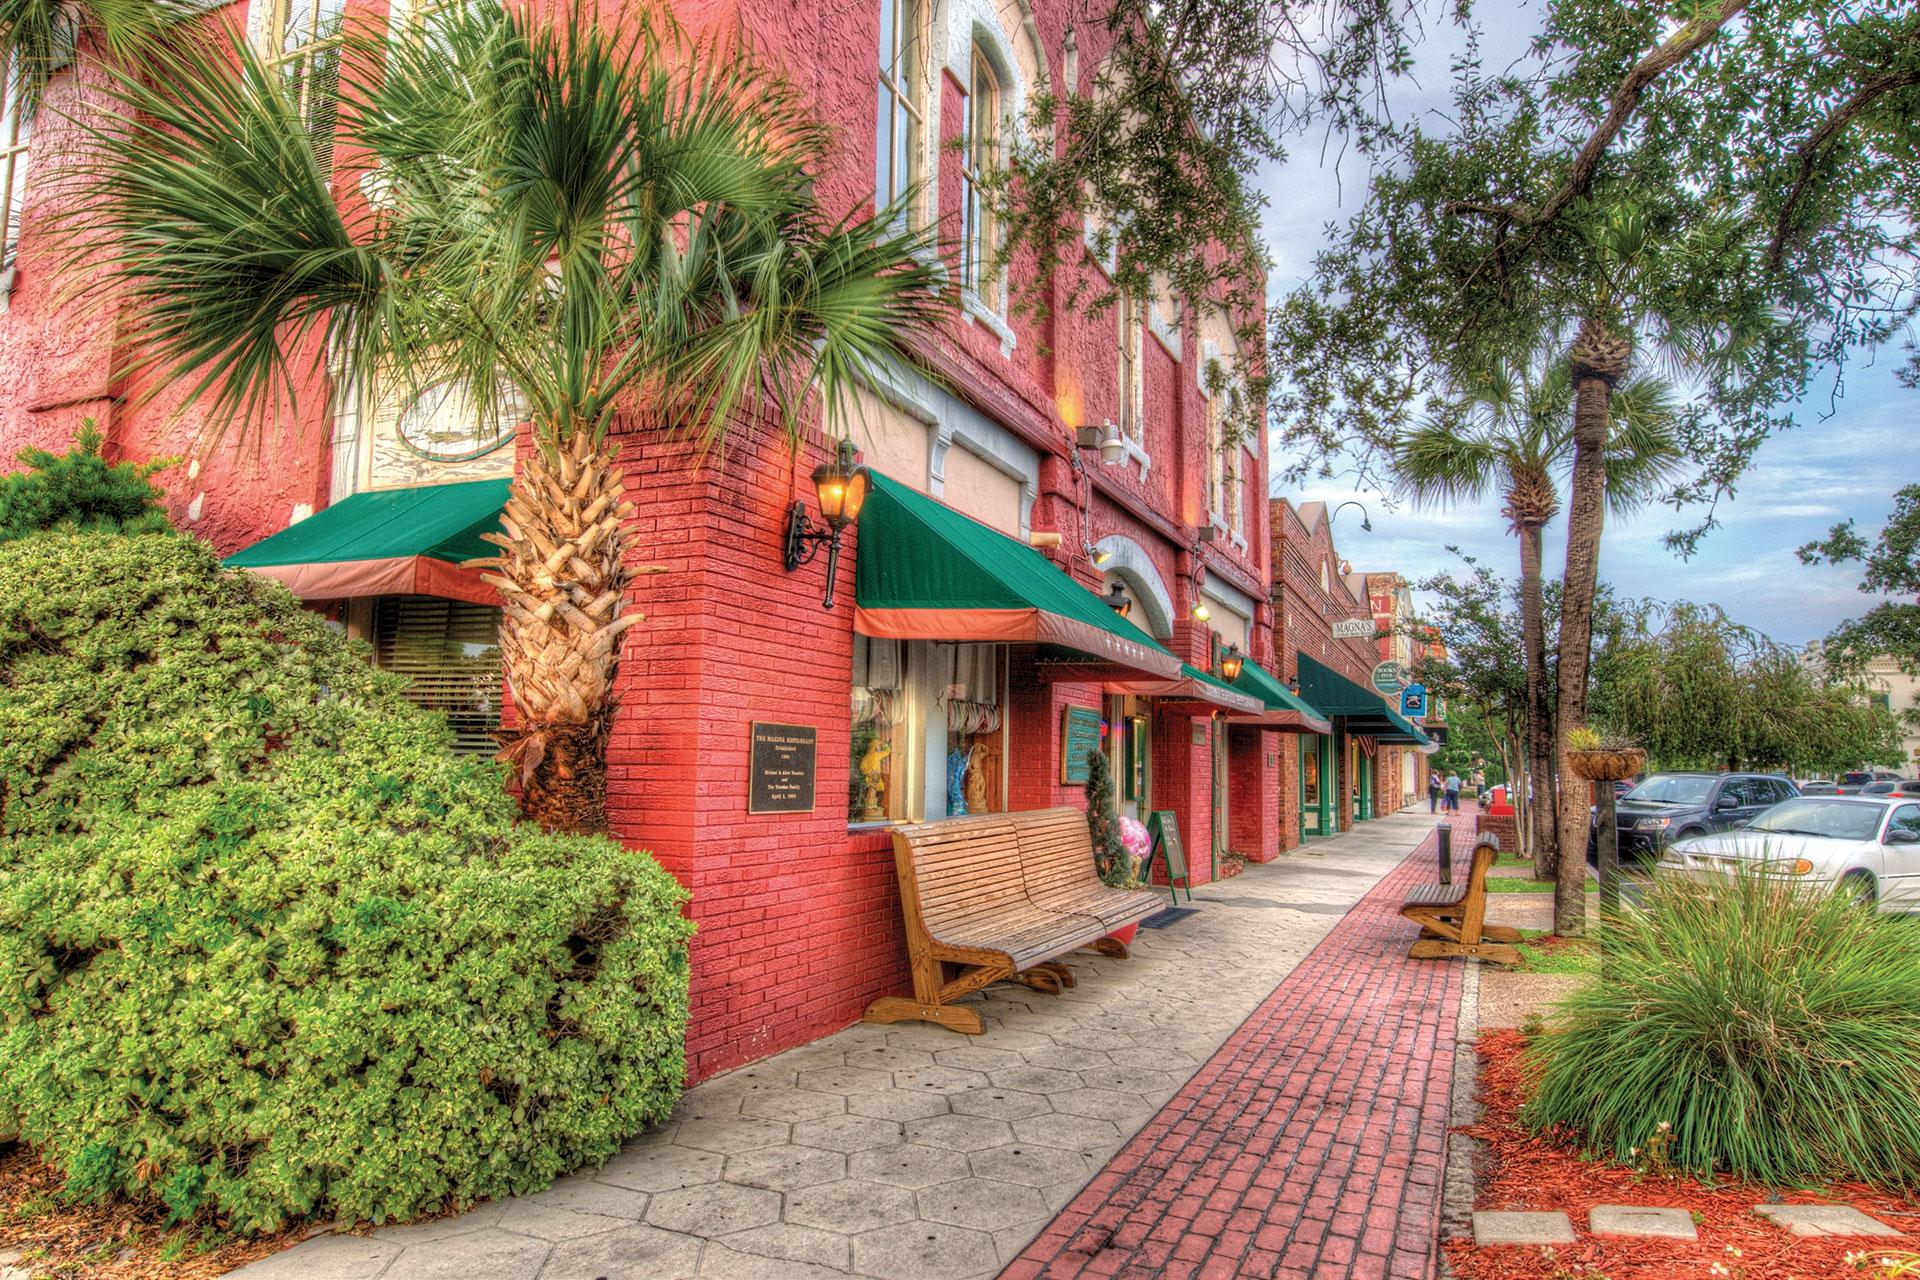 Downtown Amelia Island; Courtesy of Amelia Island Convention and Visitors Bureau